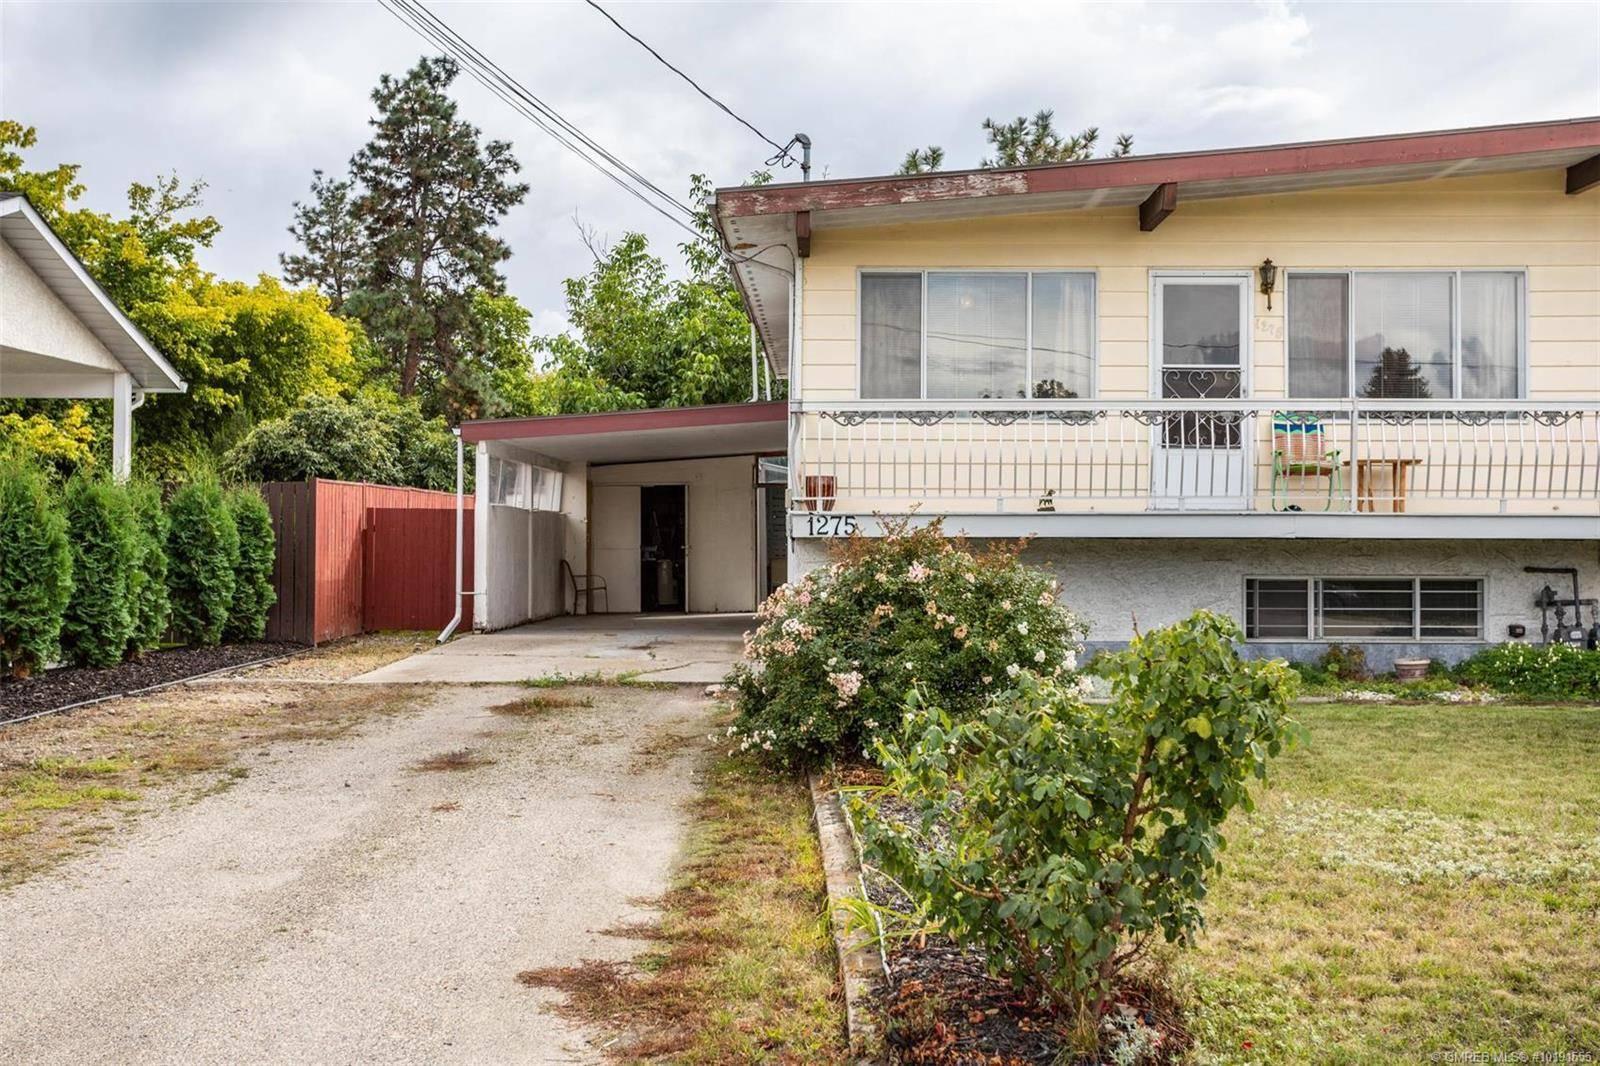 Townhouse for sale at 1275 Graham Rd Kelowna British Columbia - MLS: 10191555